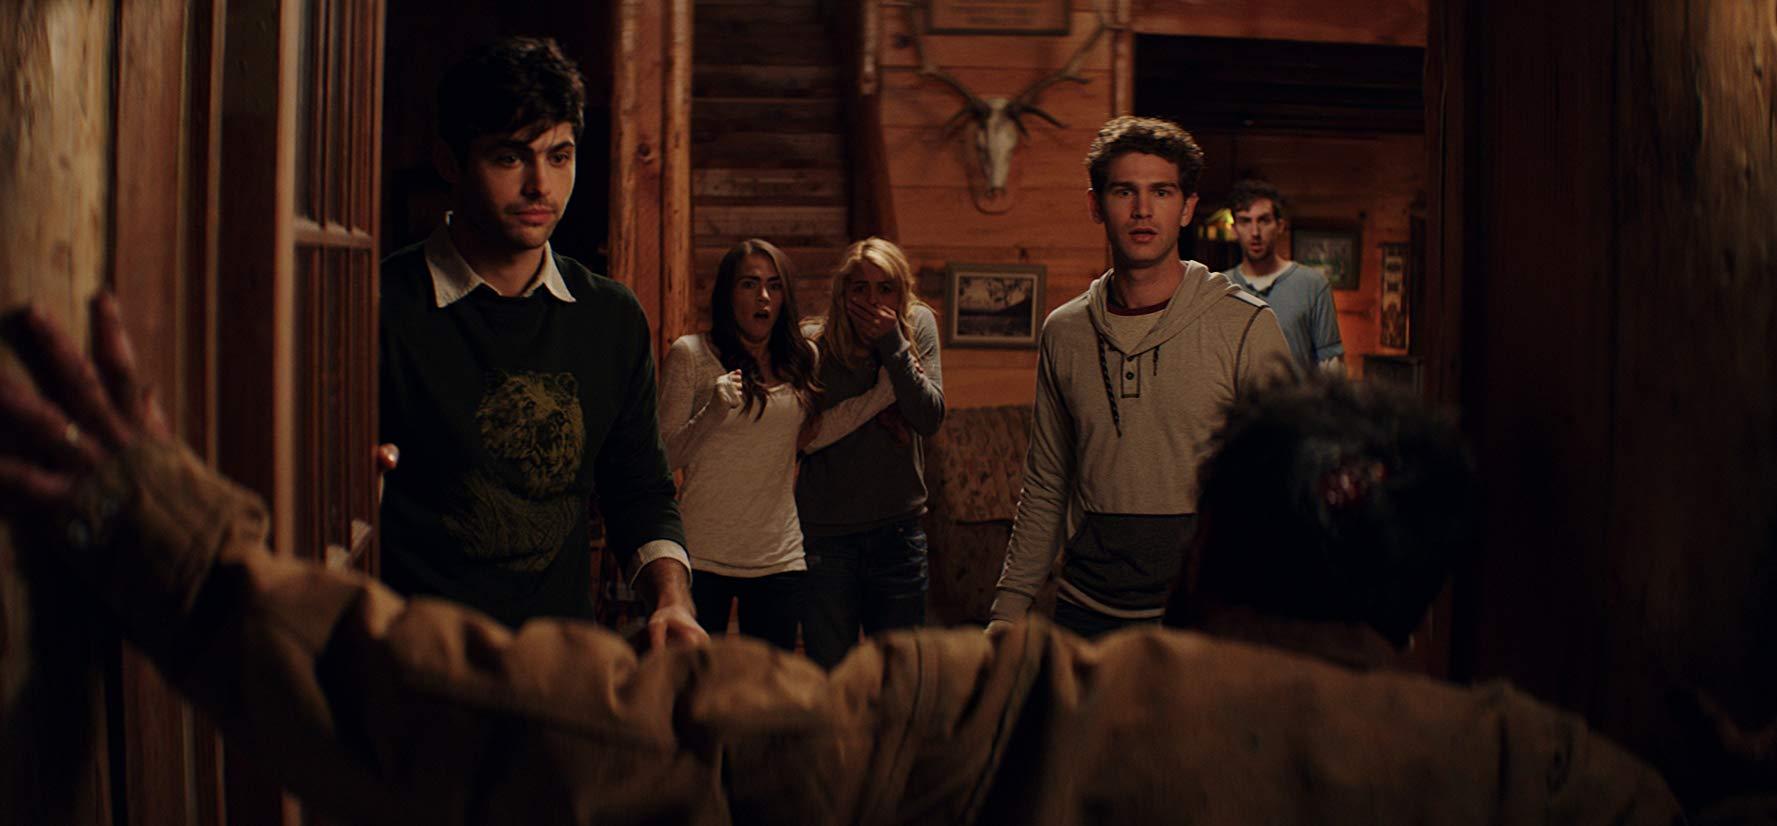 Matthew Daddario, Nadine Crocker, Gage Golightly, Samuel Davis and Dustin Ingram in Cabin Fever (2016)